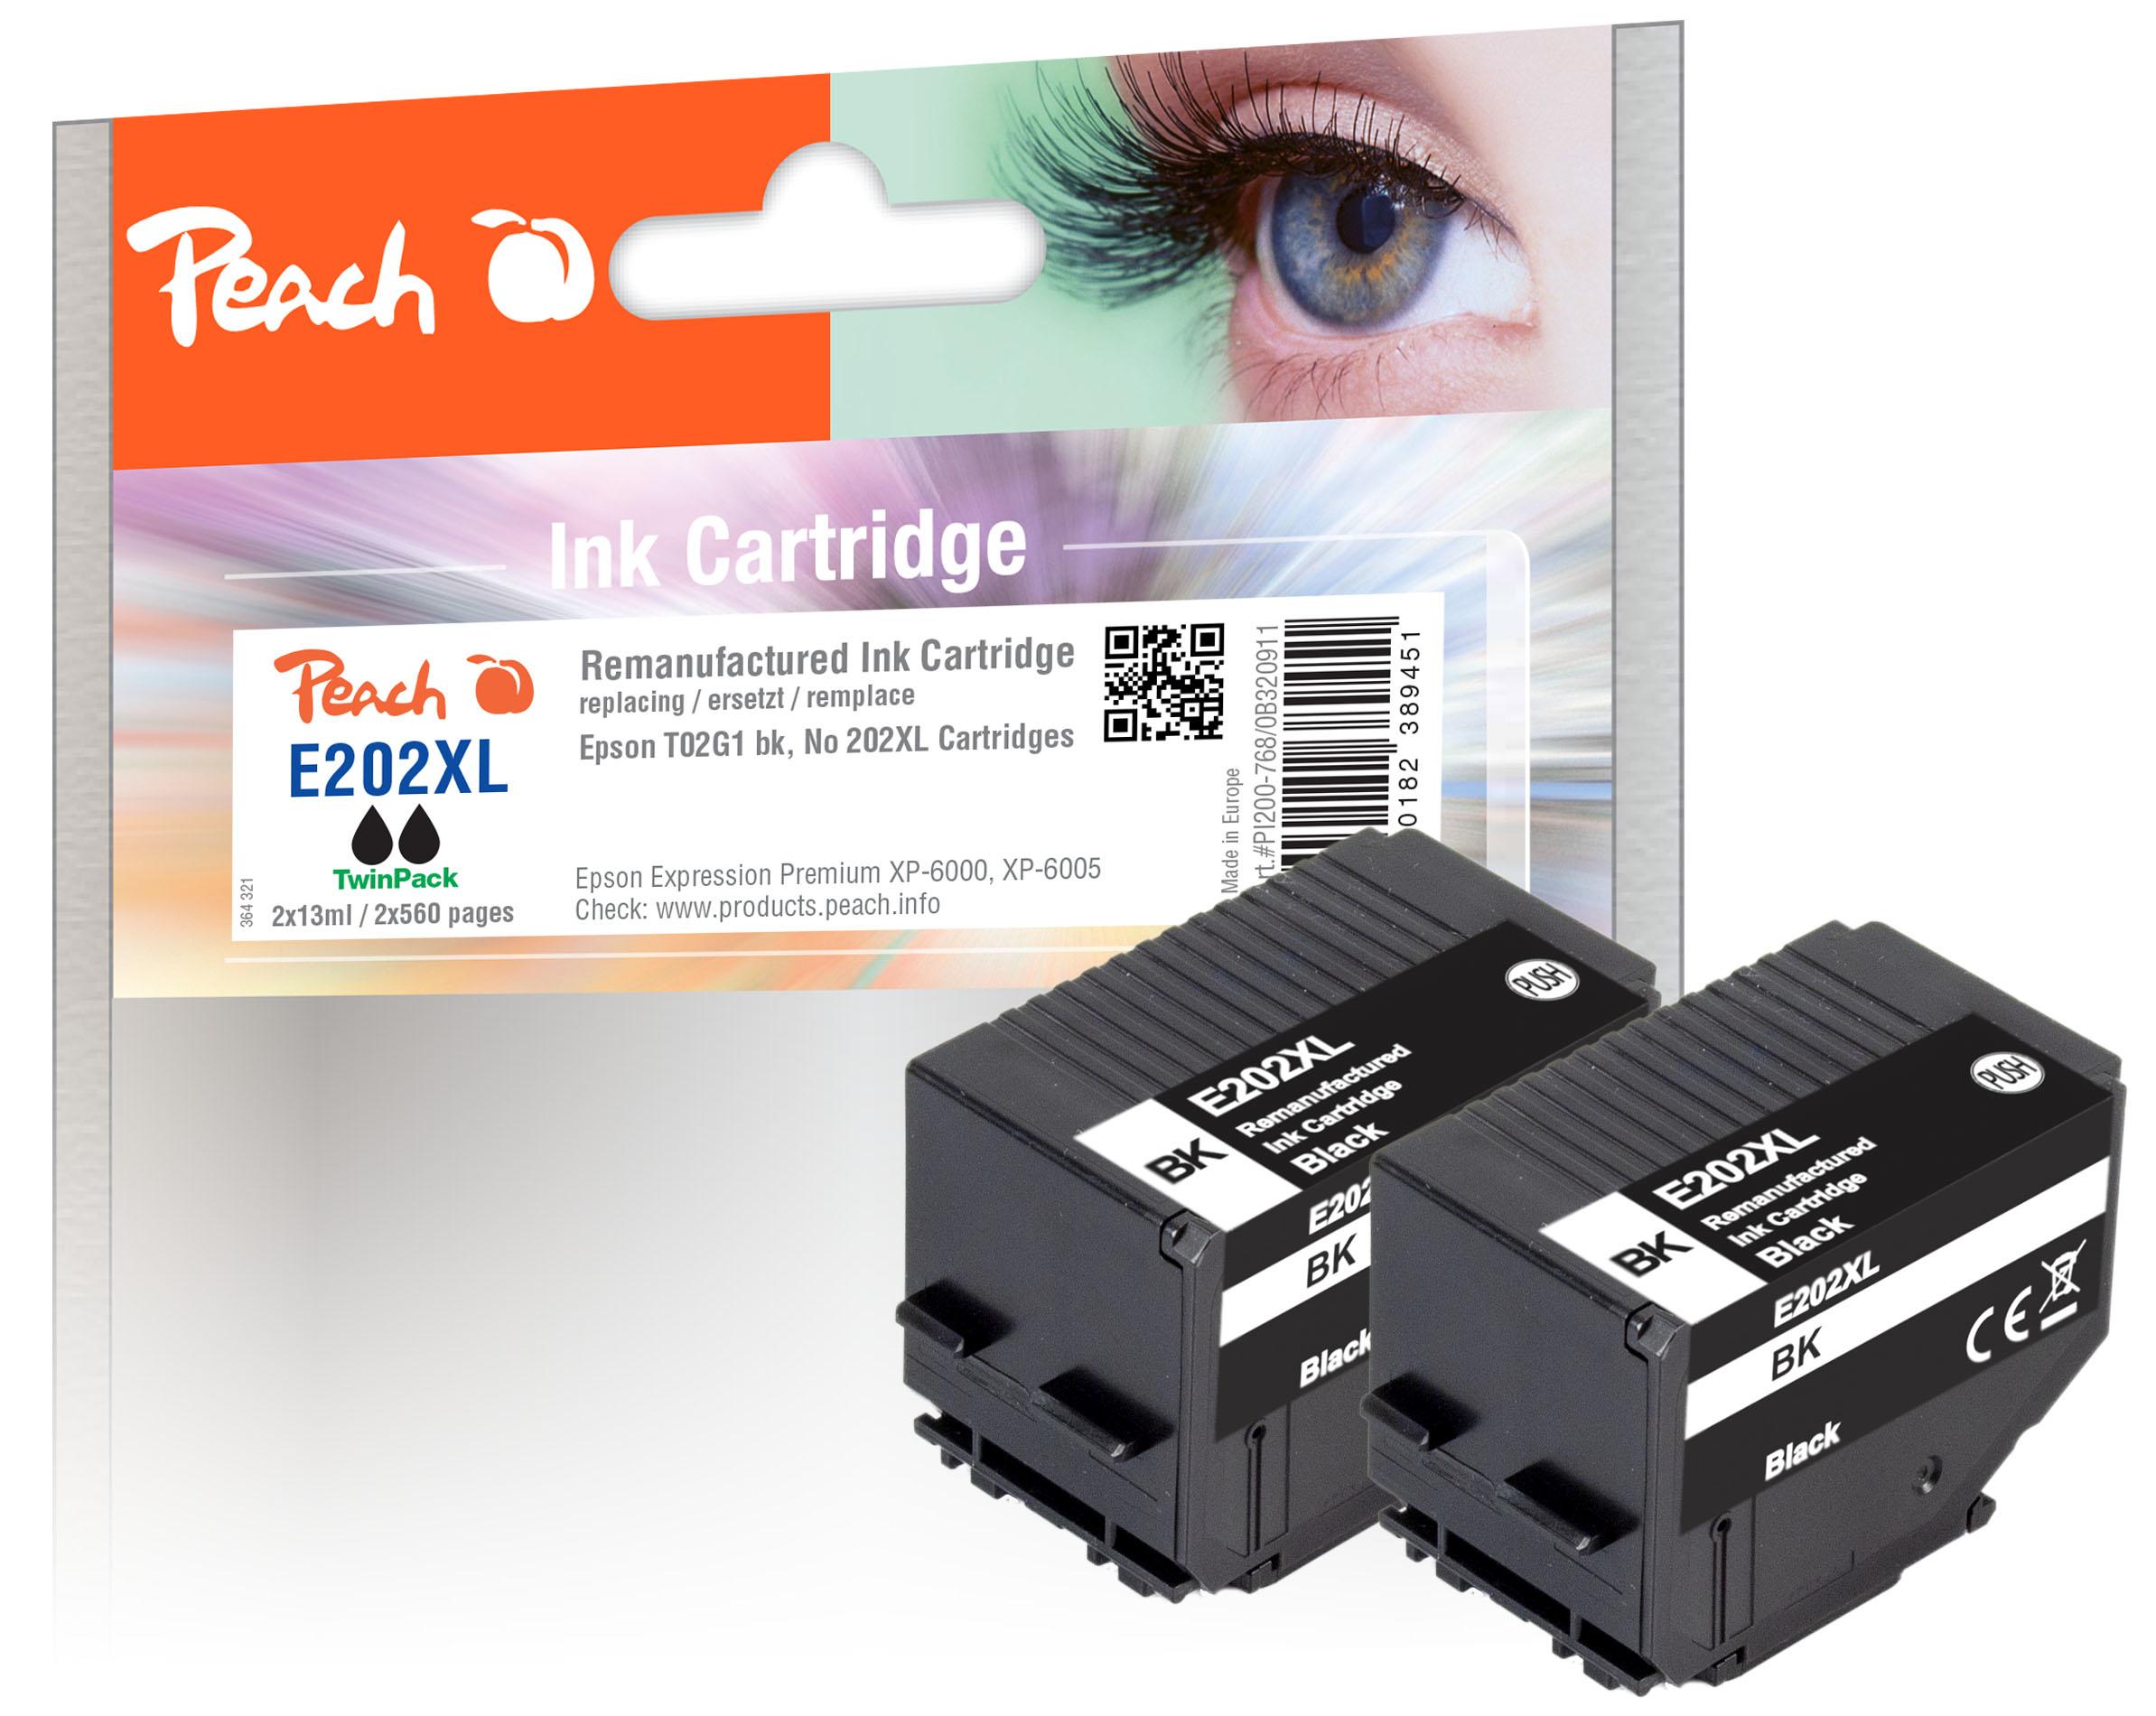 Peach PI200-768 - Kompatibel - Schwarz - Epson - Kombi-Packung - Expression Premium XP-6000 - Expression Premium XP-6005 - Expression Premium XP-6100 - Expression... - 2 Stück(e)